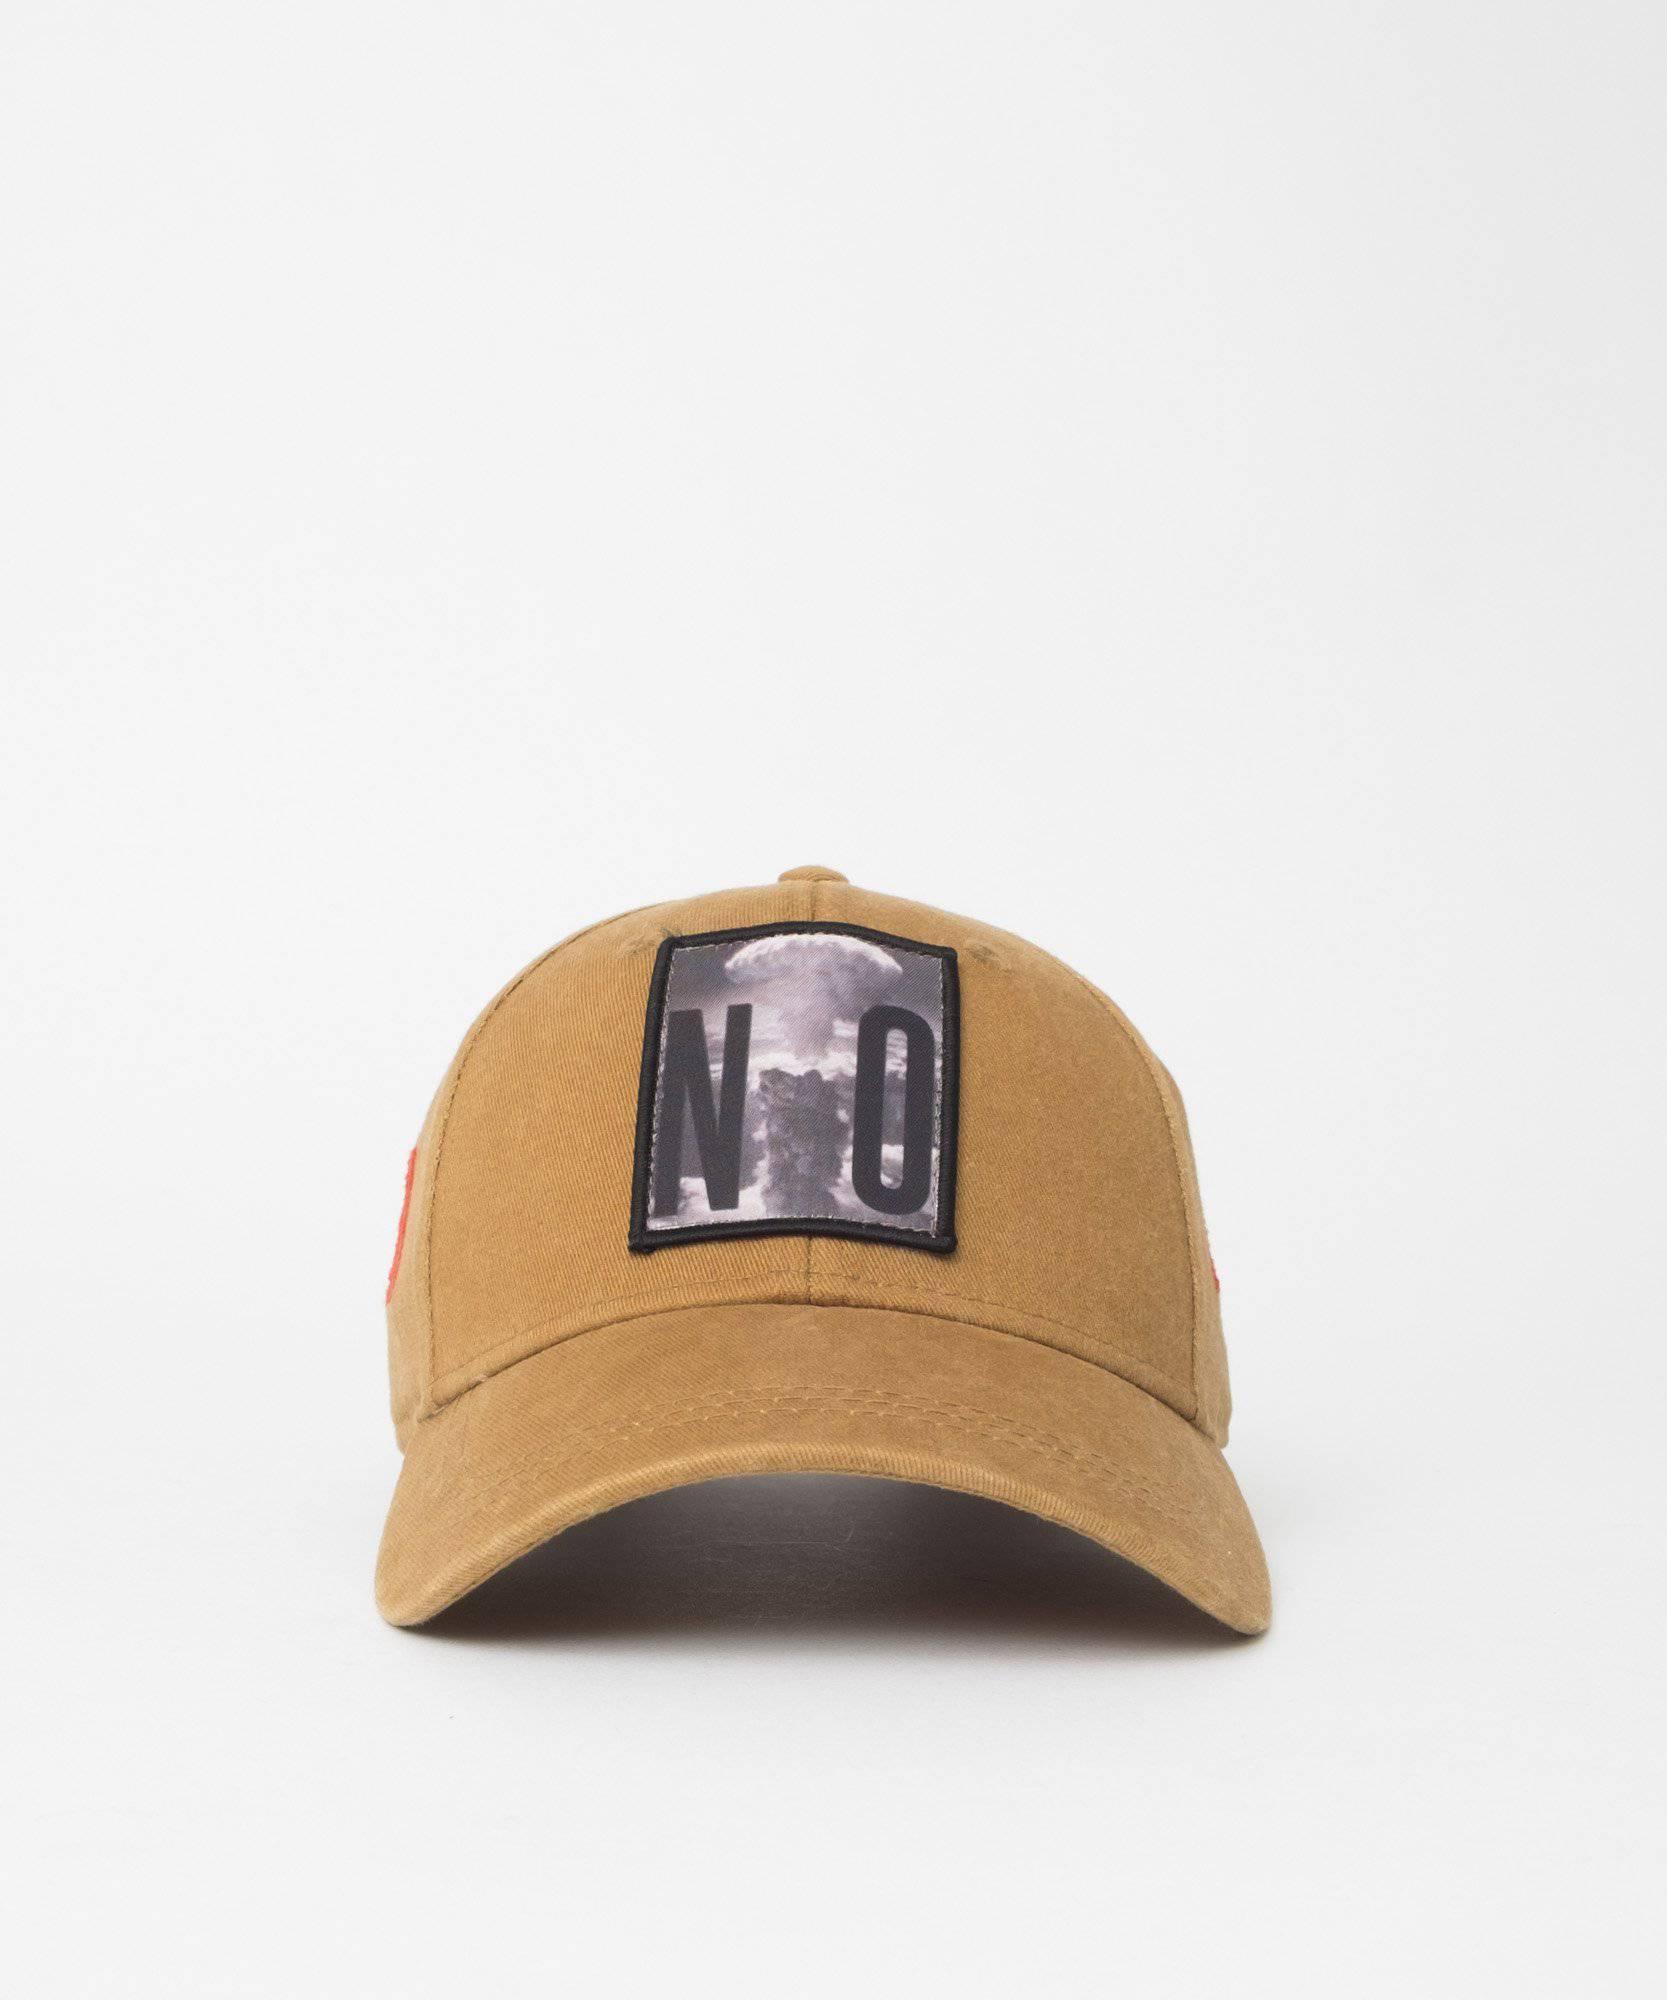 Patta Say No Way cap